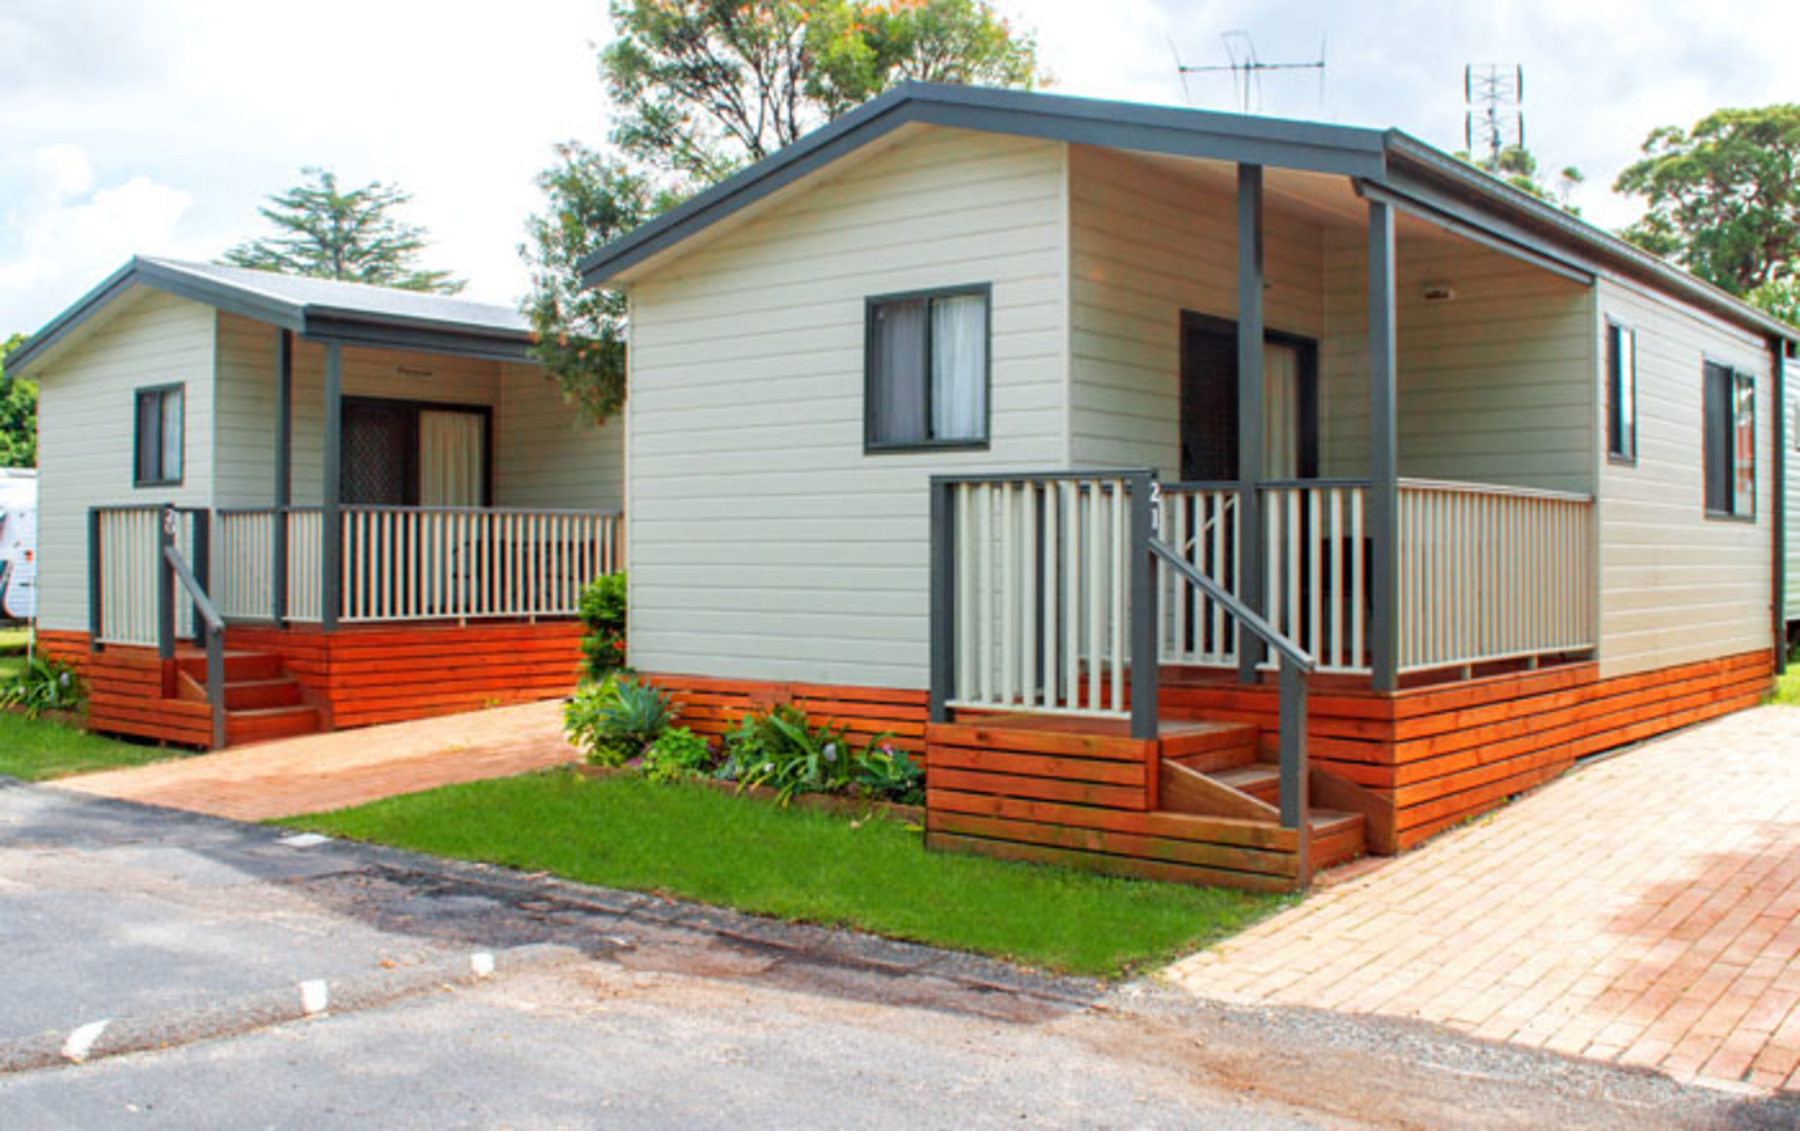 Walu Caravan Park - Budgewoi - Central Coast - NSW | Pet Friendly